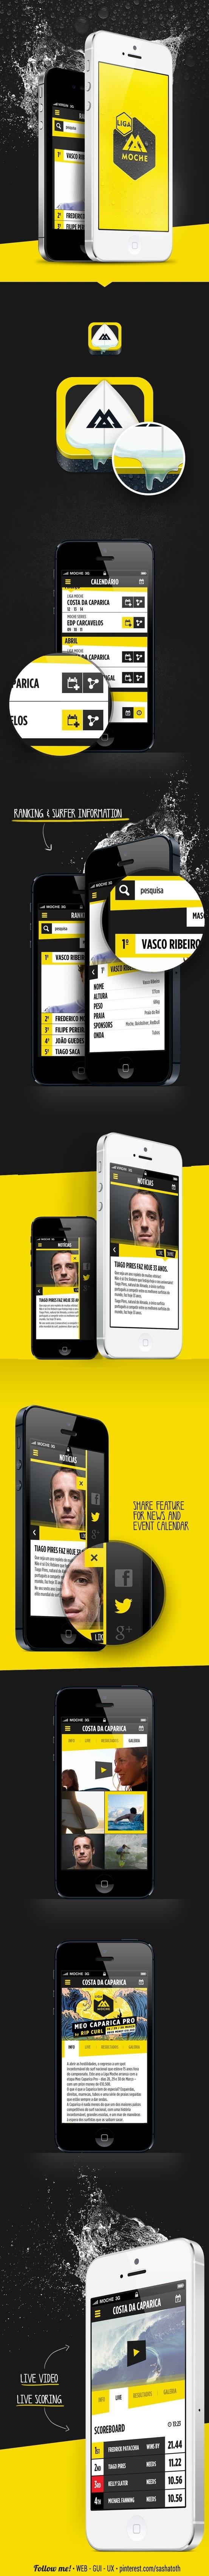 Liga Moche iOS App concept #ui #ux #mobile